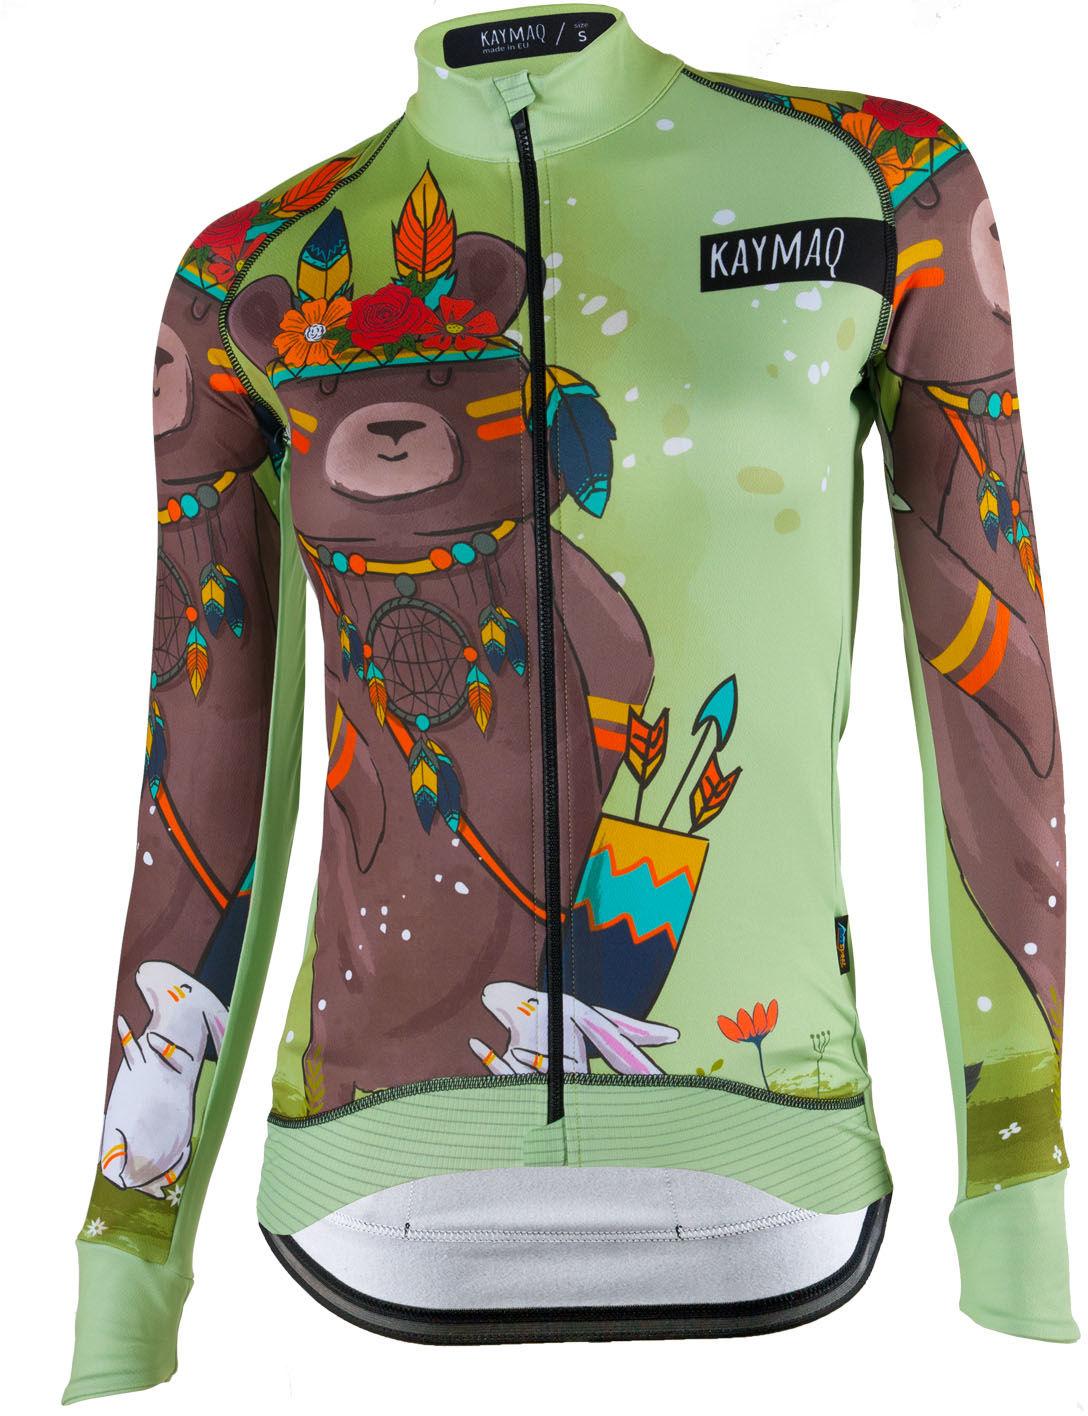 KAYMAQ DESIGN W12 damska bluza rowerowa Rozmiar: M,KMQ-W12